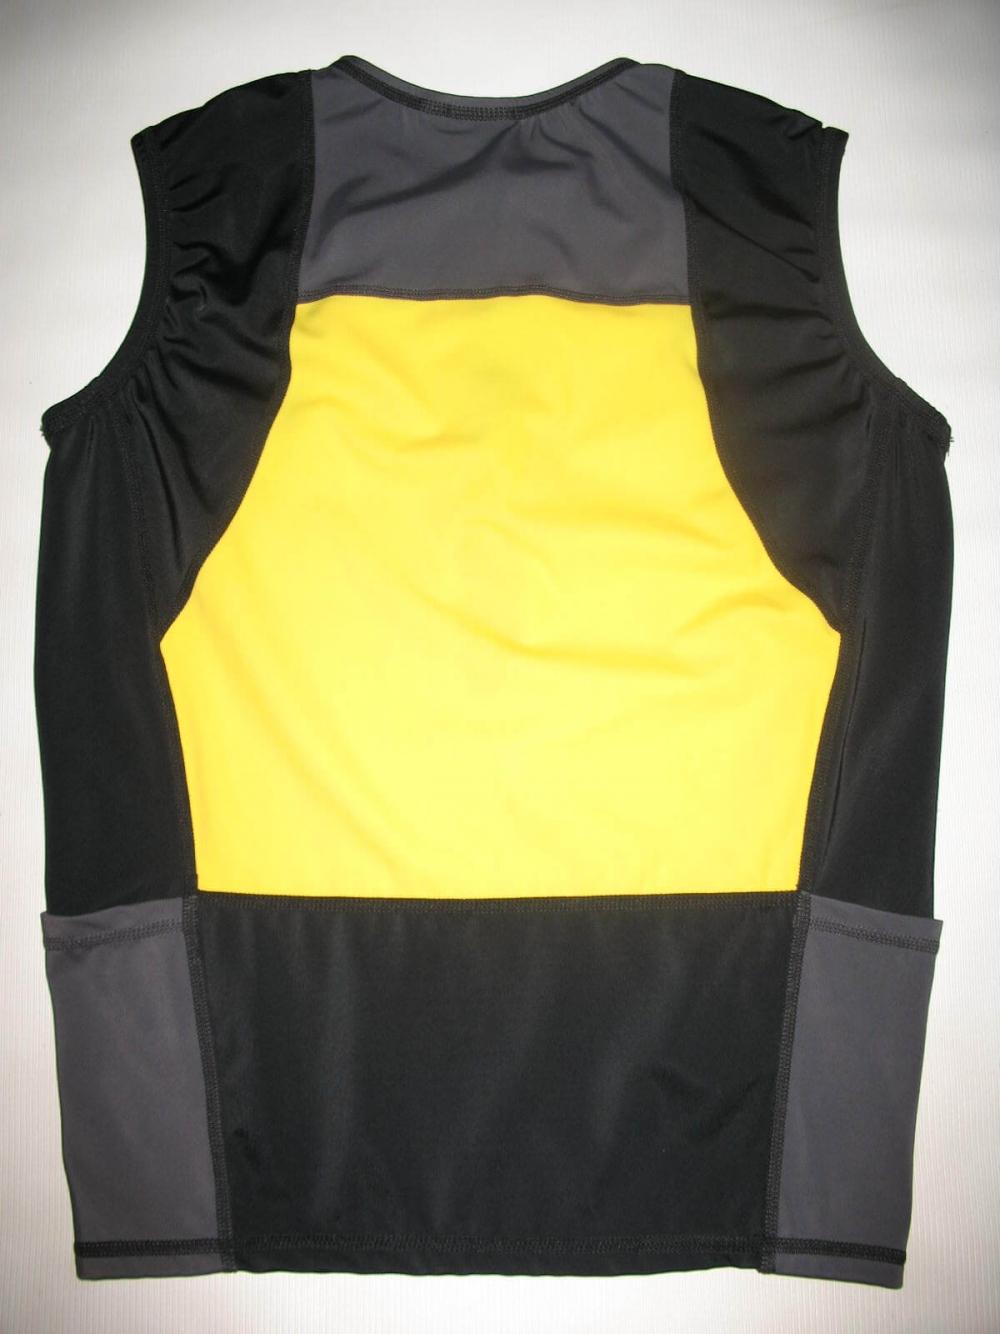 Футболка ROSE triathlon top shirt (размер M) - 1